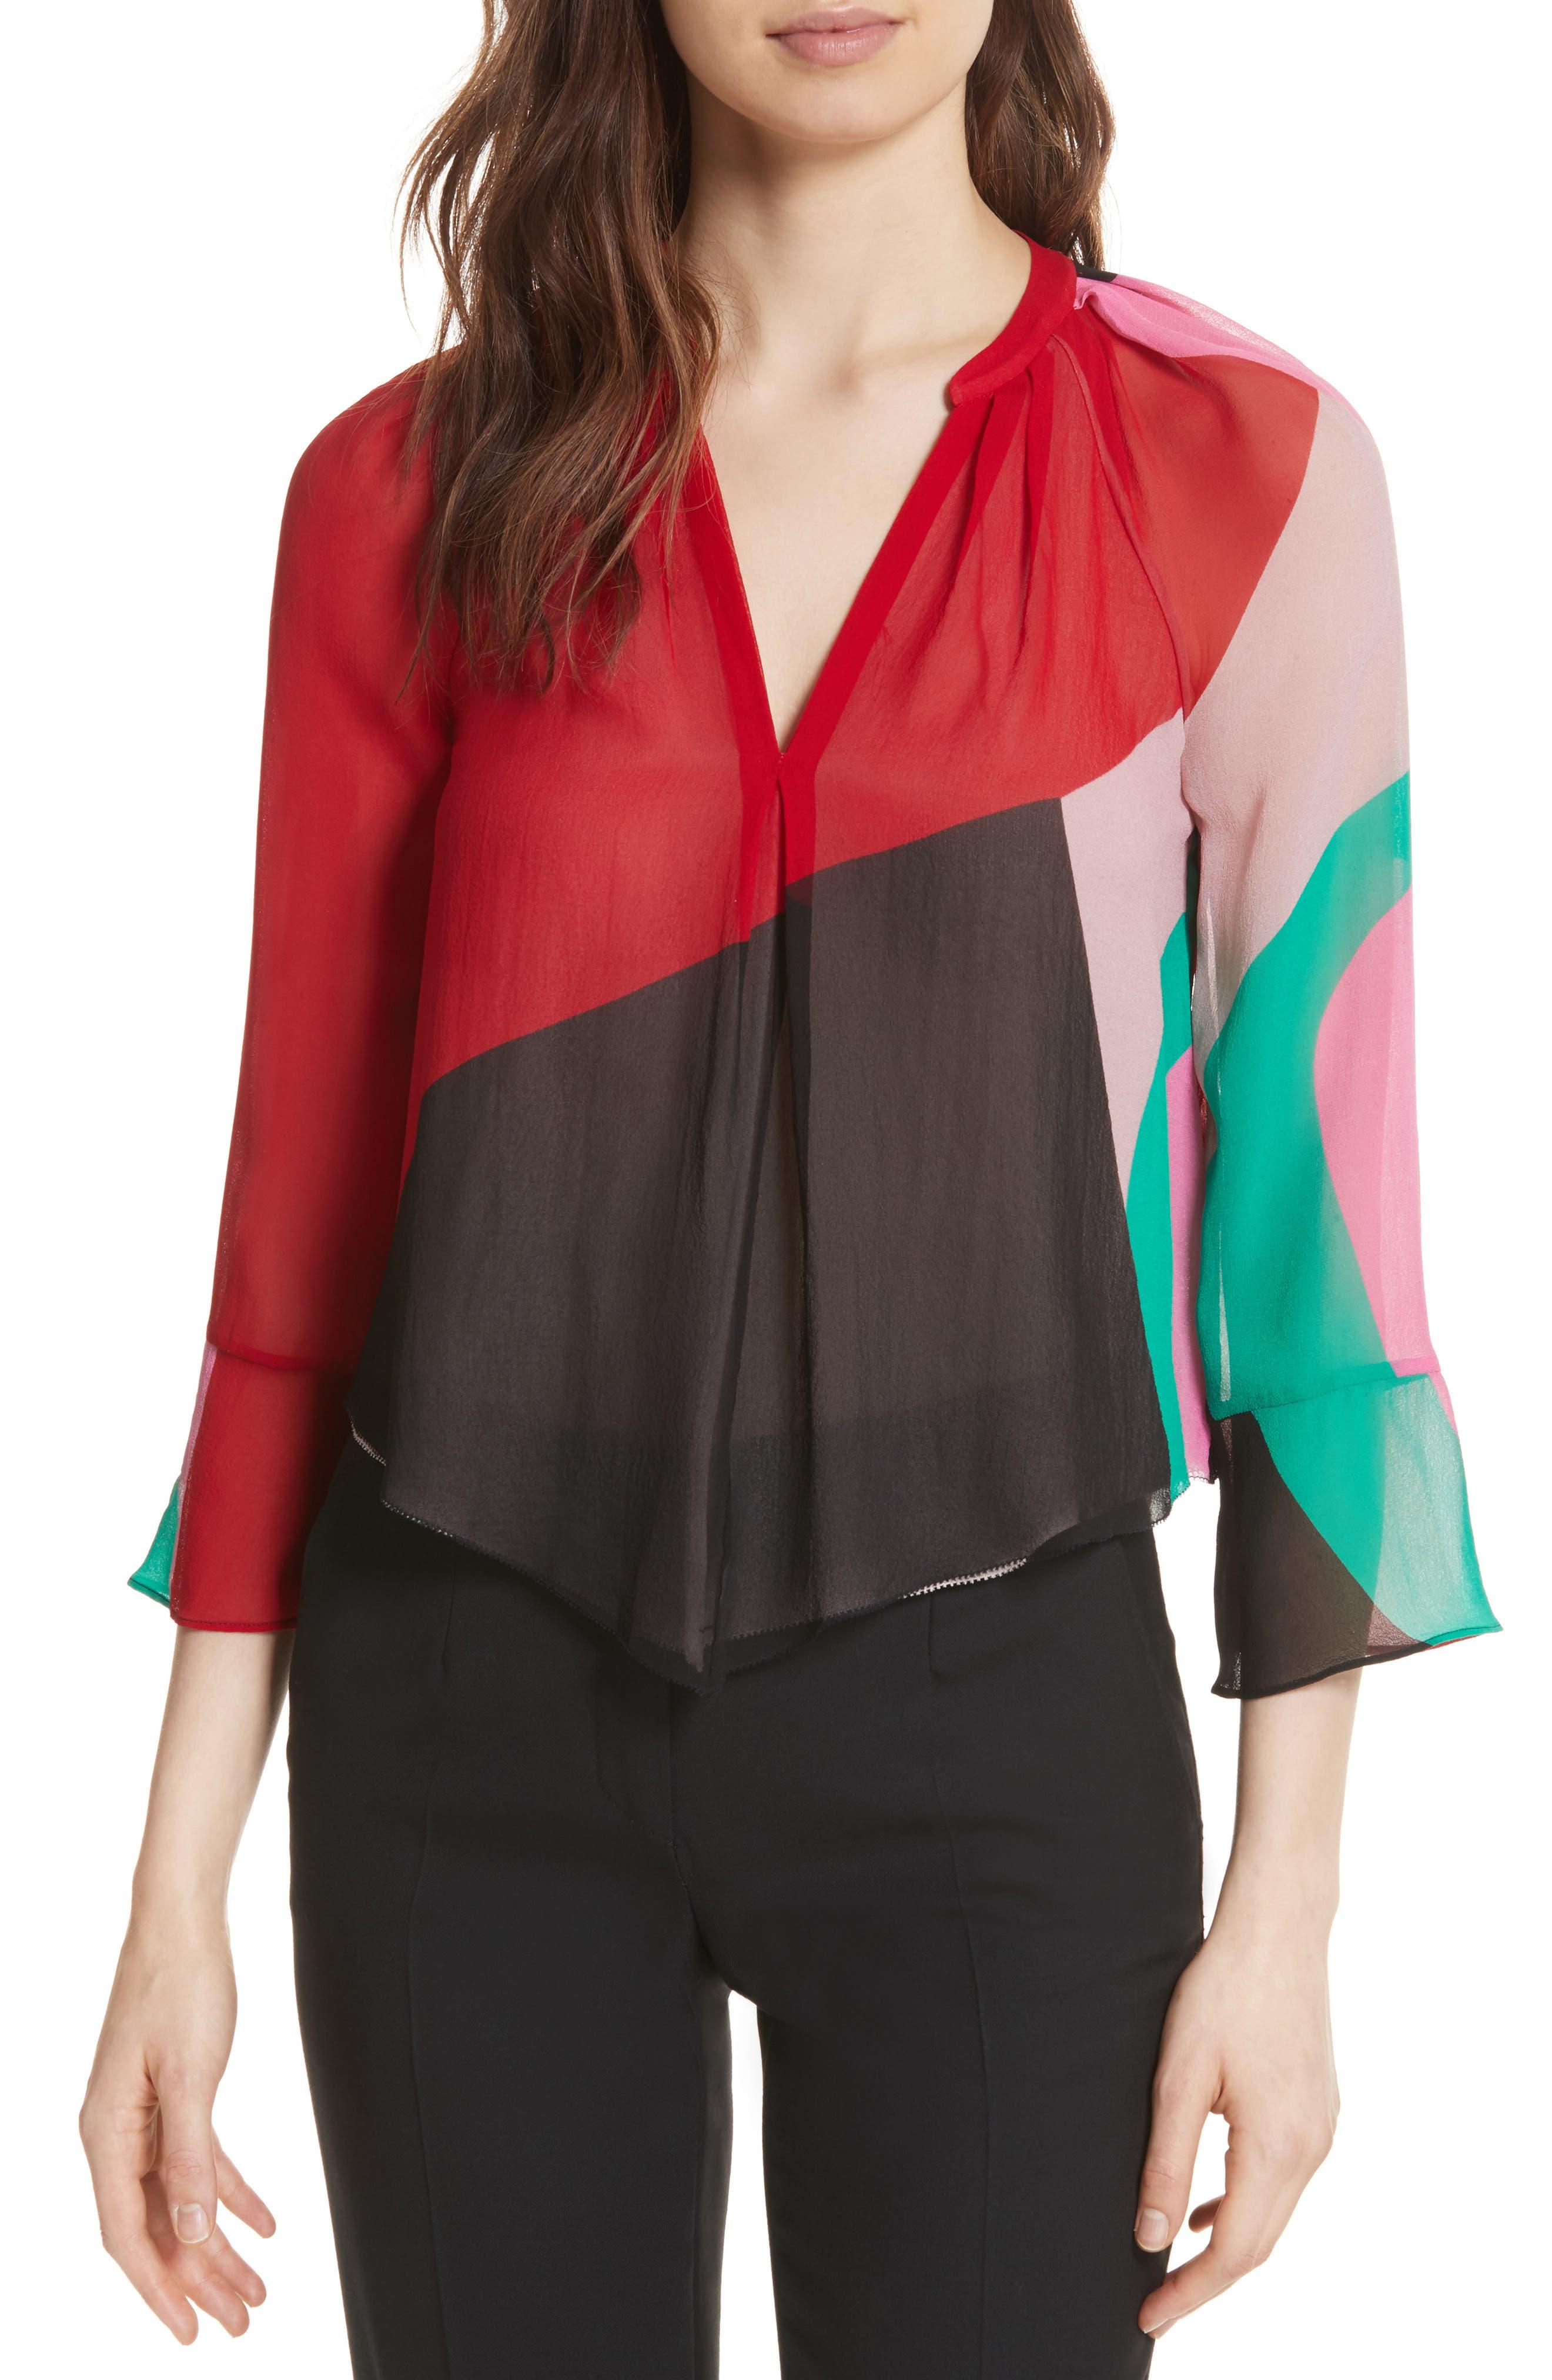 Quinlynn Colorblock Silk Top,                             Main thumbnail 1, color,                             Multi